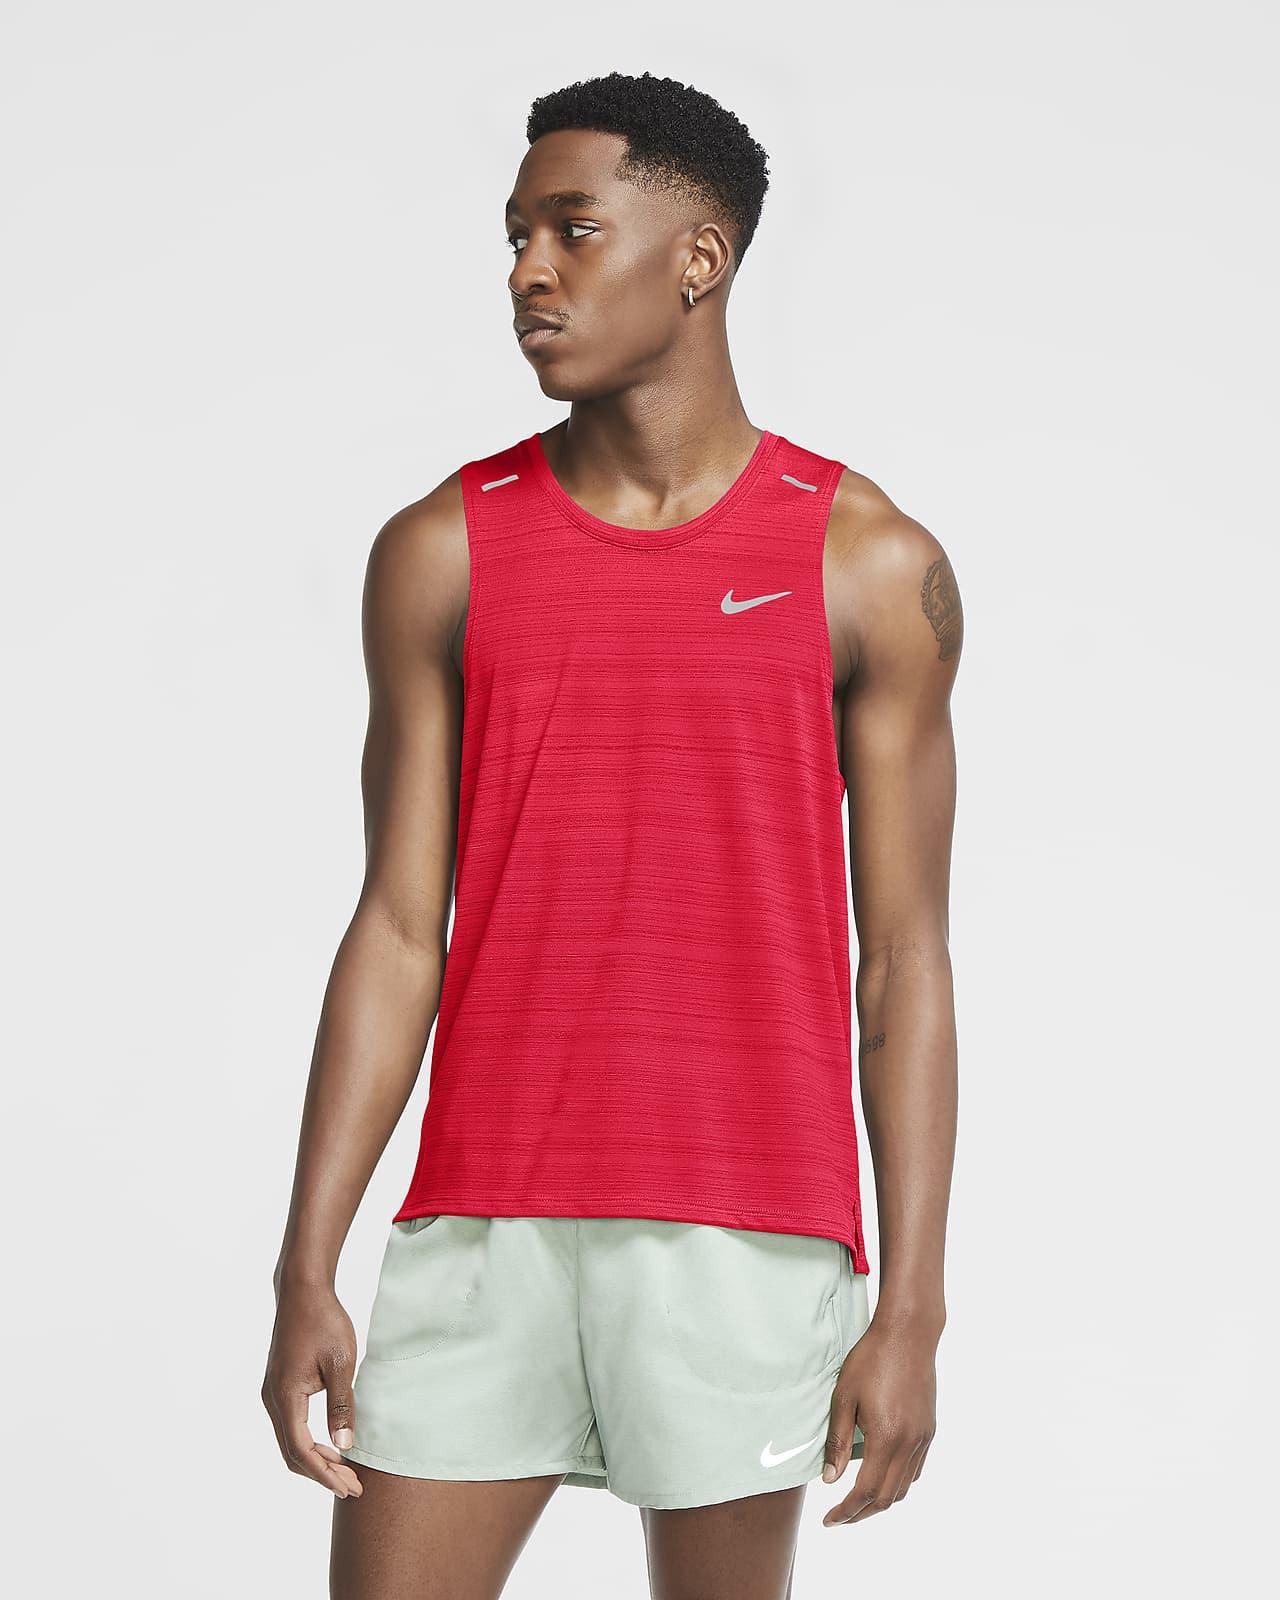 Nike Dri-FIT Miler Men's Running Tank